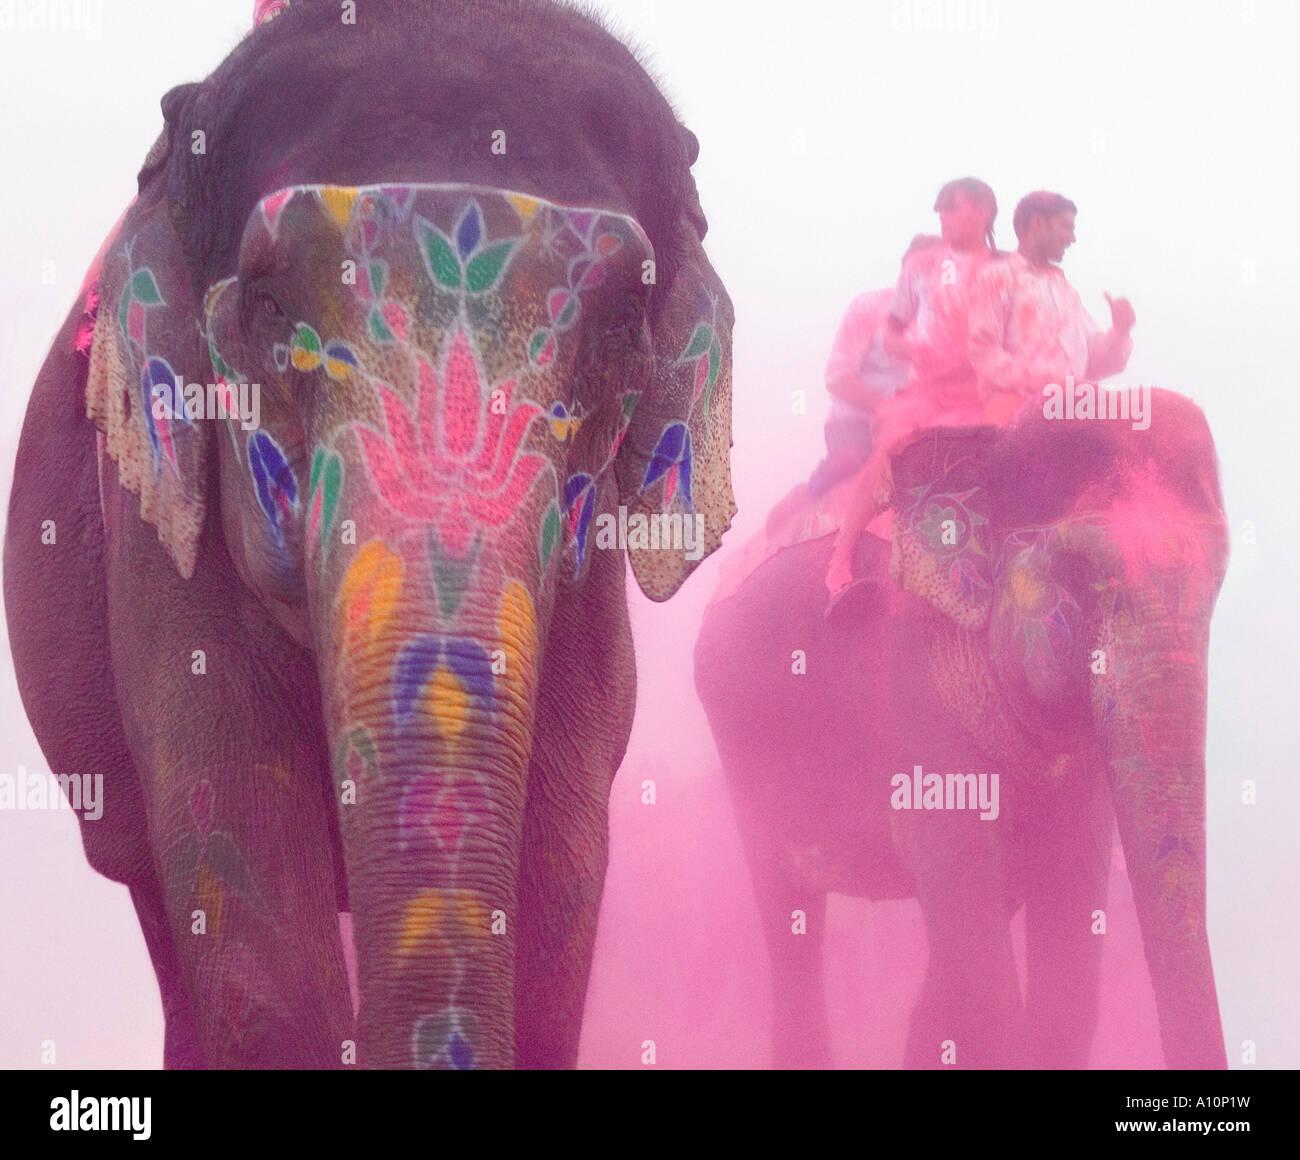 Drei Elefanten bei einem Elefanten Festival, Jaipur, Rajasthan, Indien Stockbild